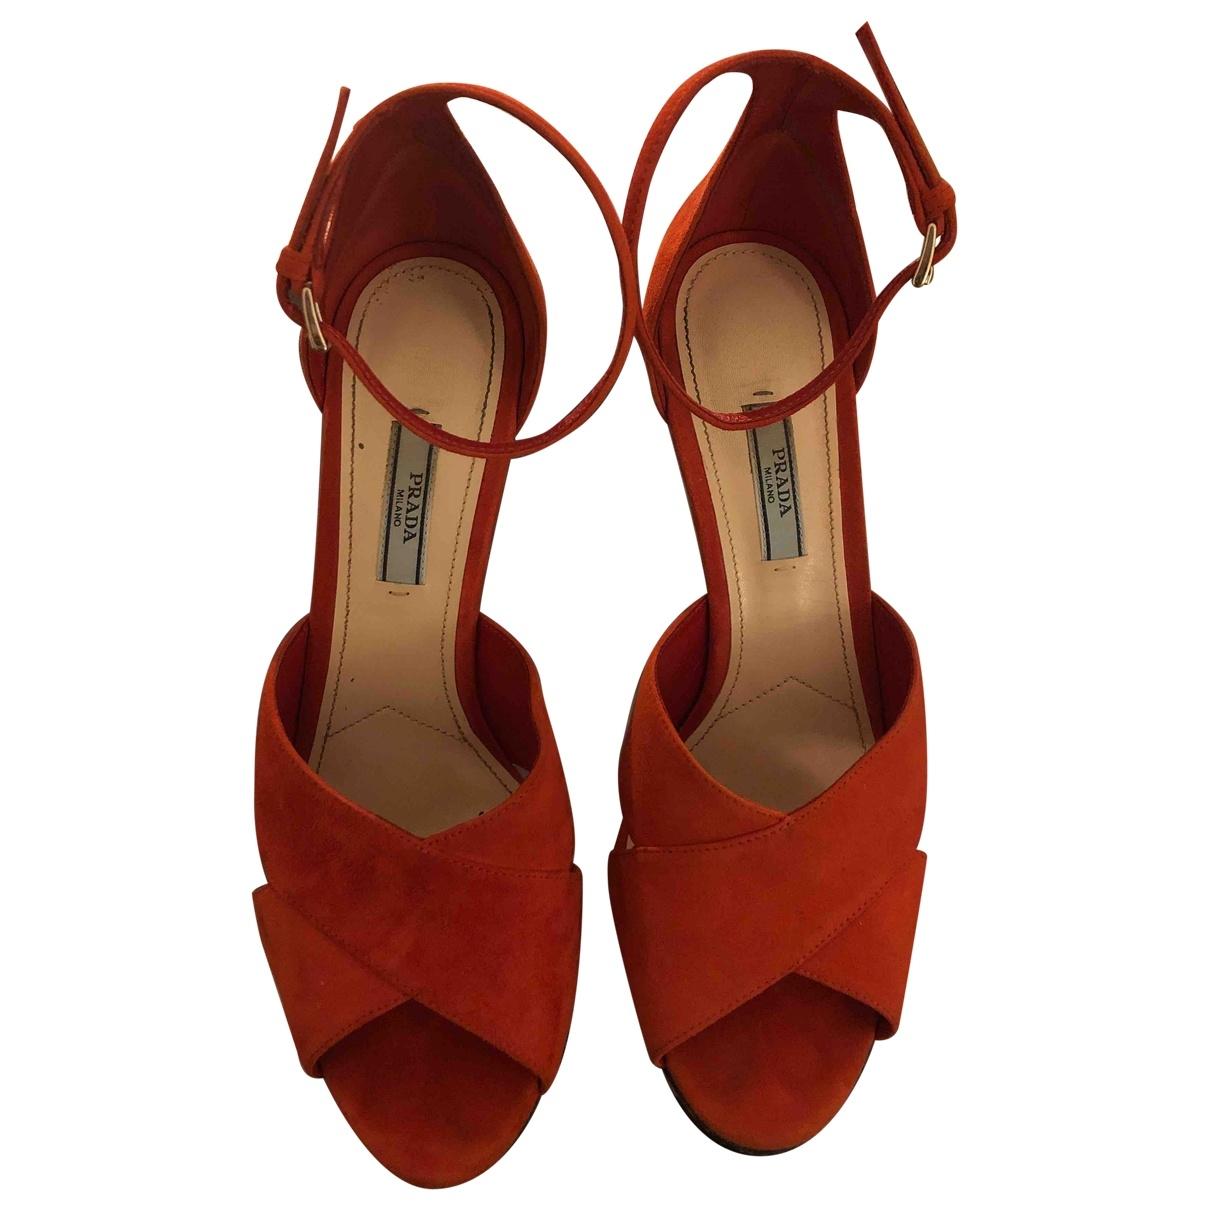 Prada - Sandales   pour femme en suede - orange